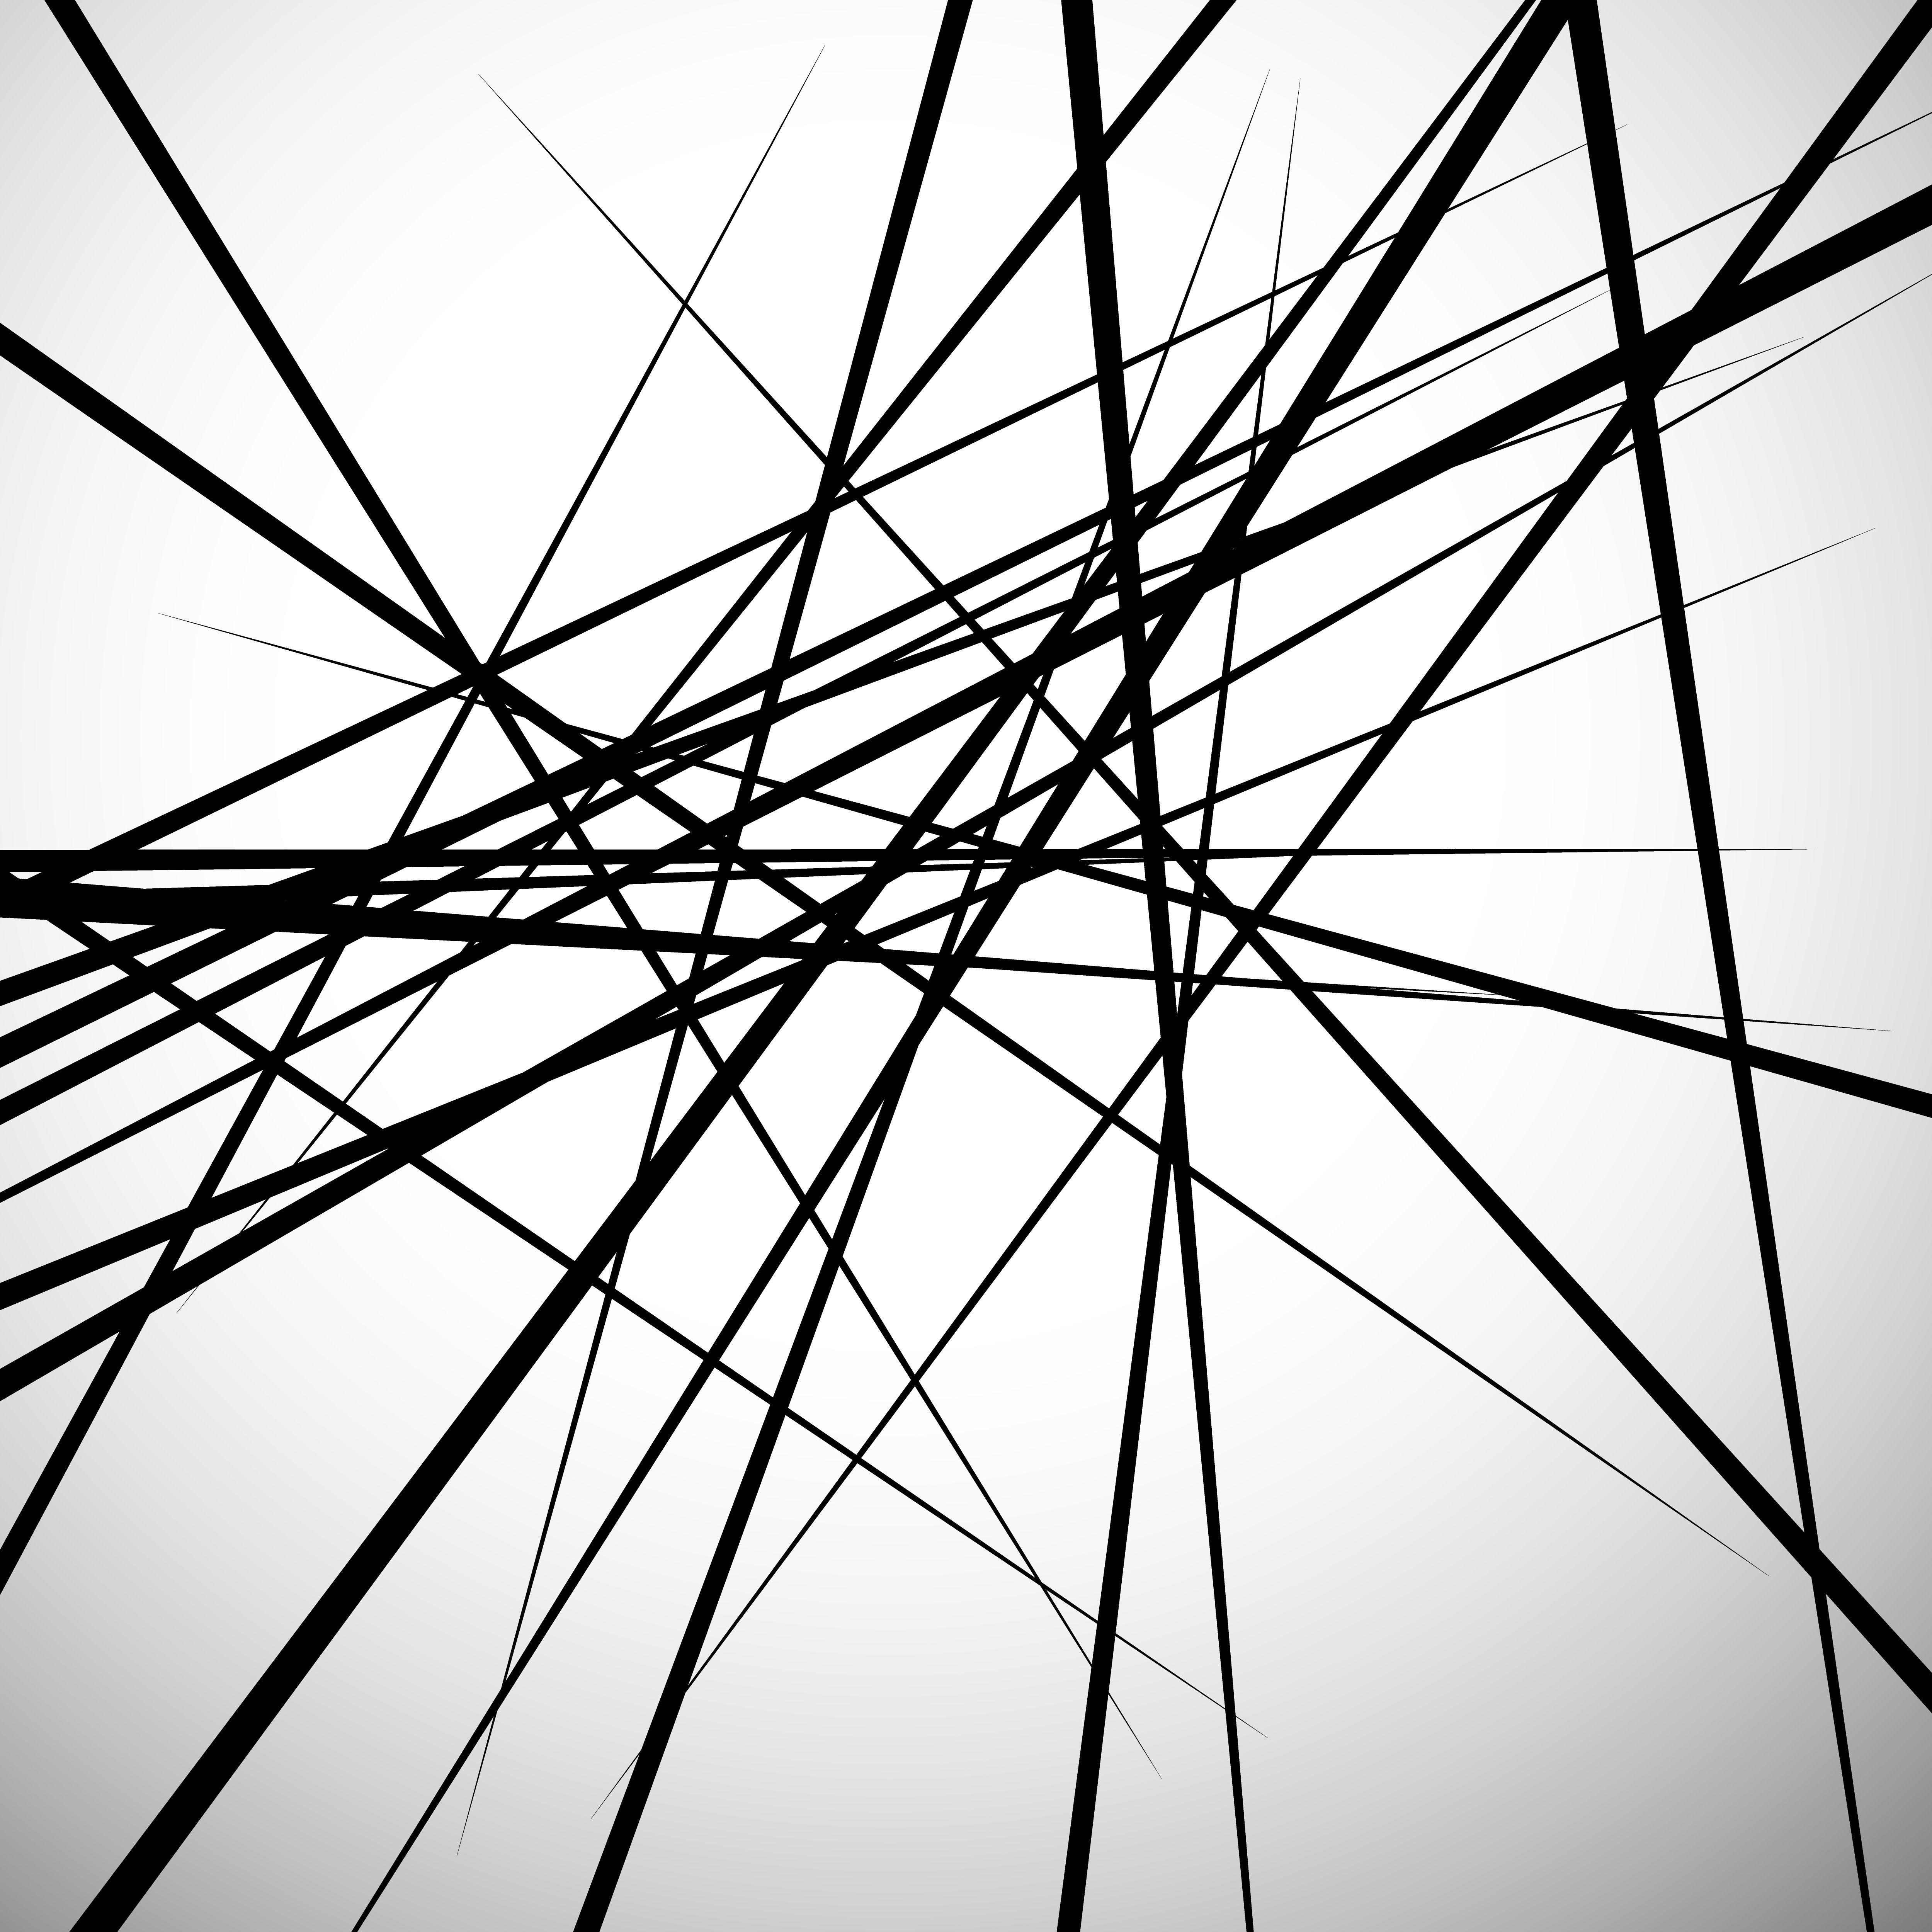 Minimalist art minimalism 5000 5000 art for What is minimalism